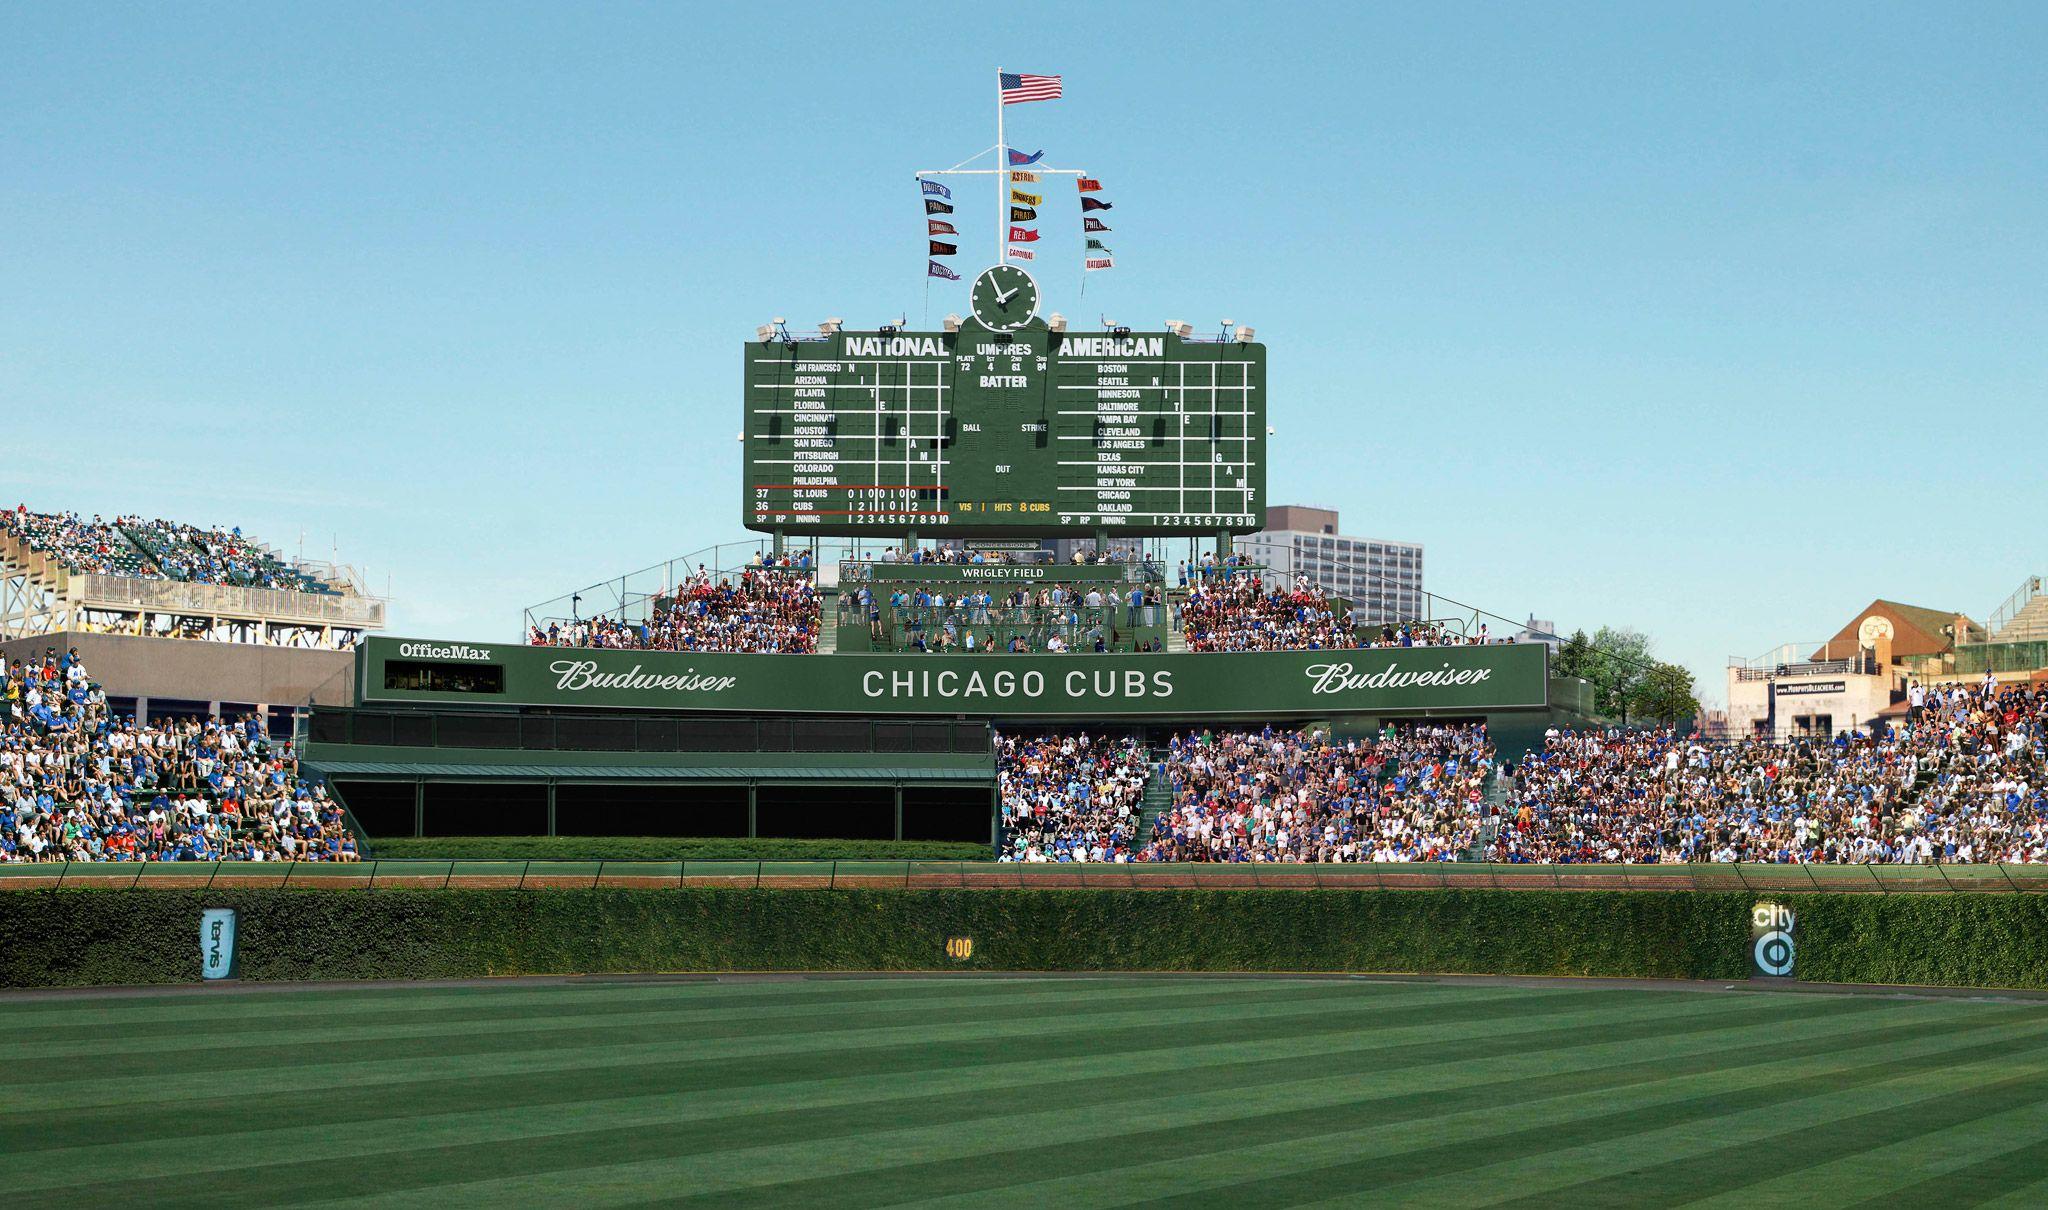 Proposed Wrigley Field Renovations Wrigley Field And Chicago - Chicago map showing wrigley field